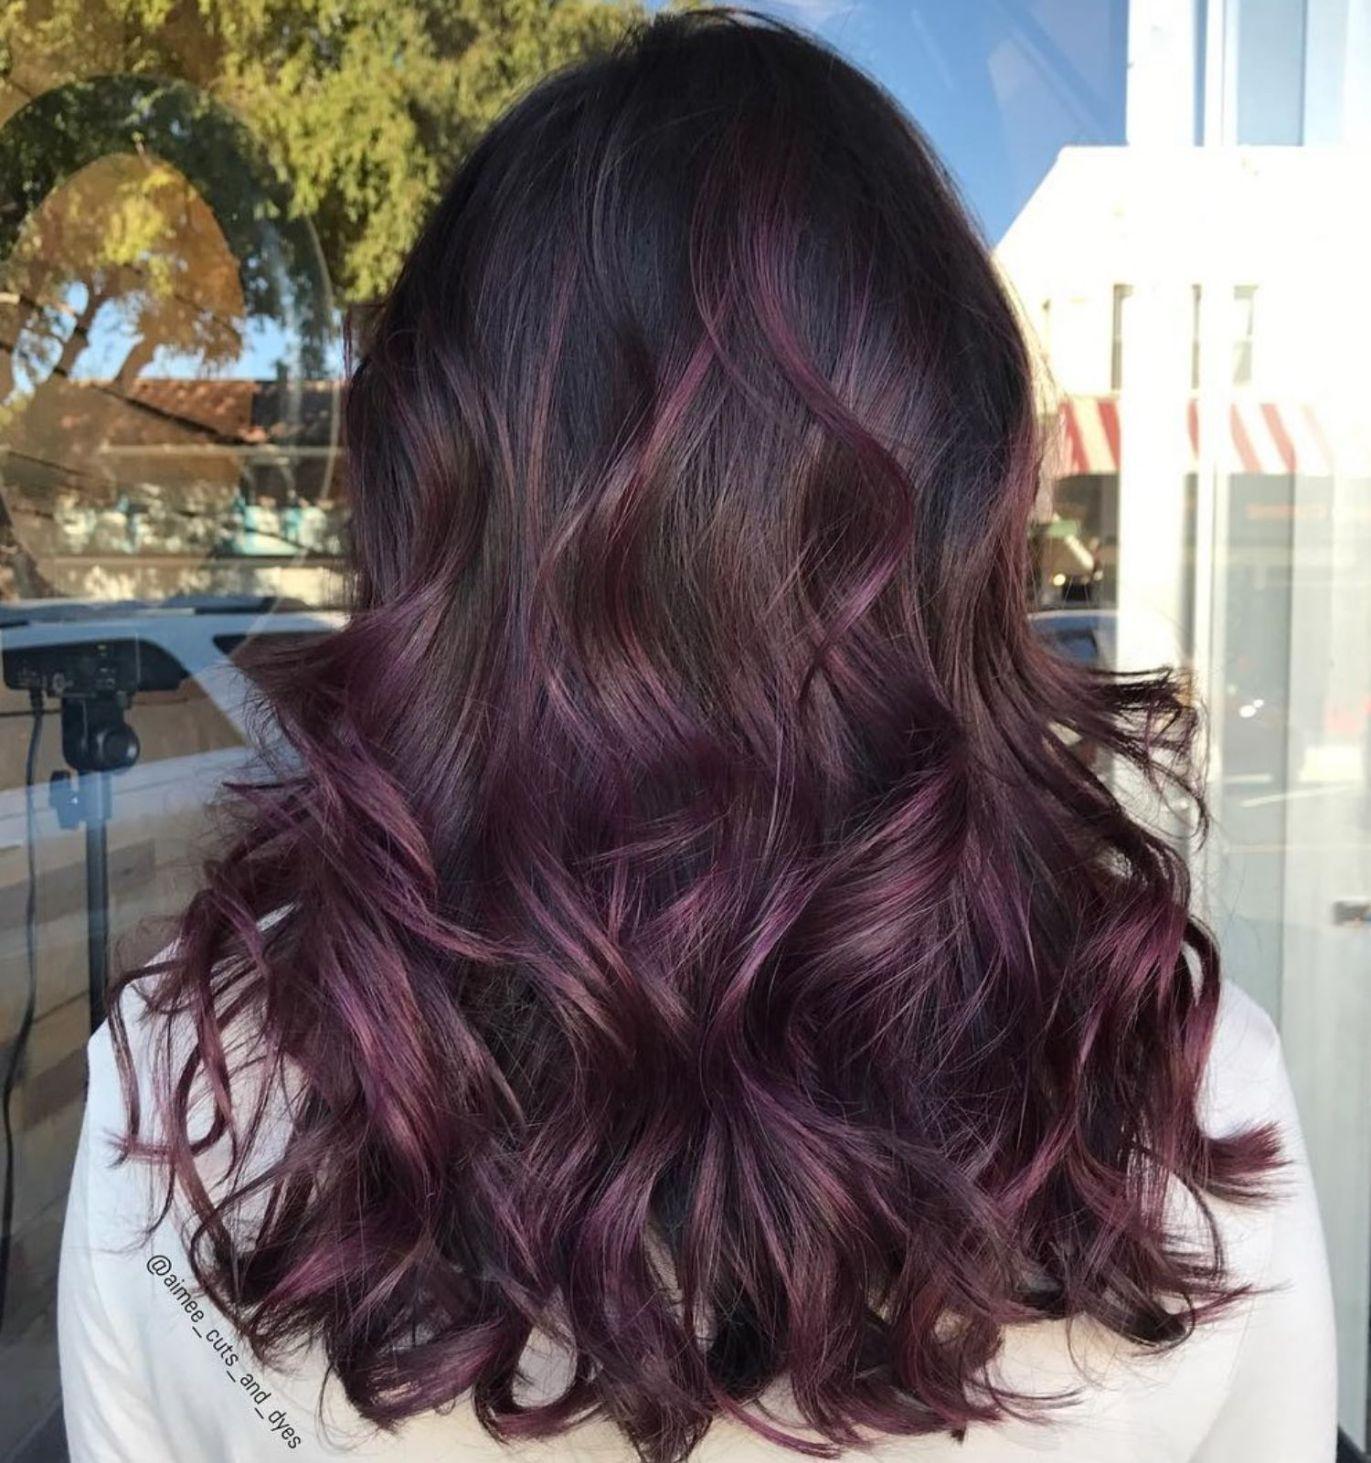 45 Shades Of Burgundy Hair Dark Burgundy Maroon Burgundy With Red Purple And Brown Highlights Purple Balayage Burgundy Hair Subtle Purple Hair